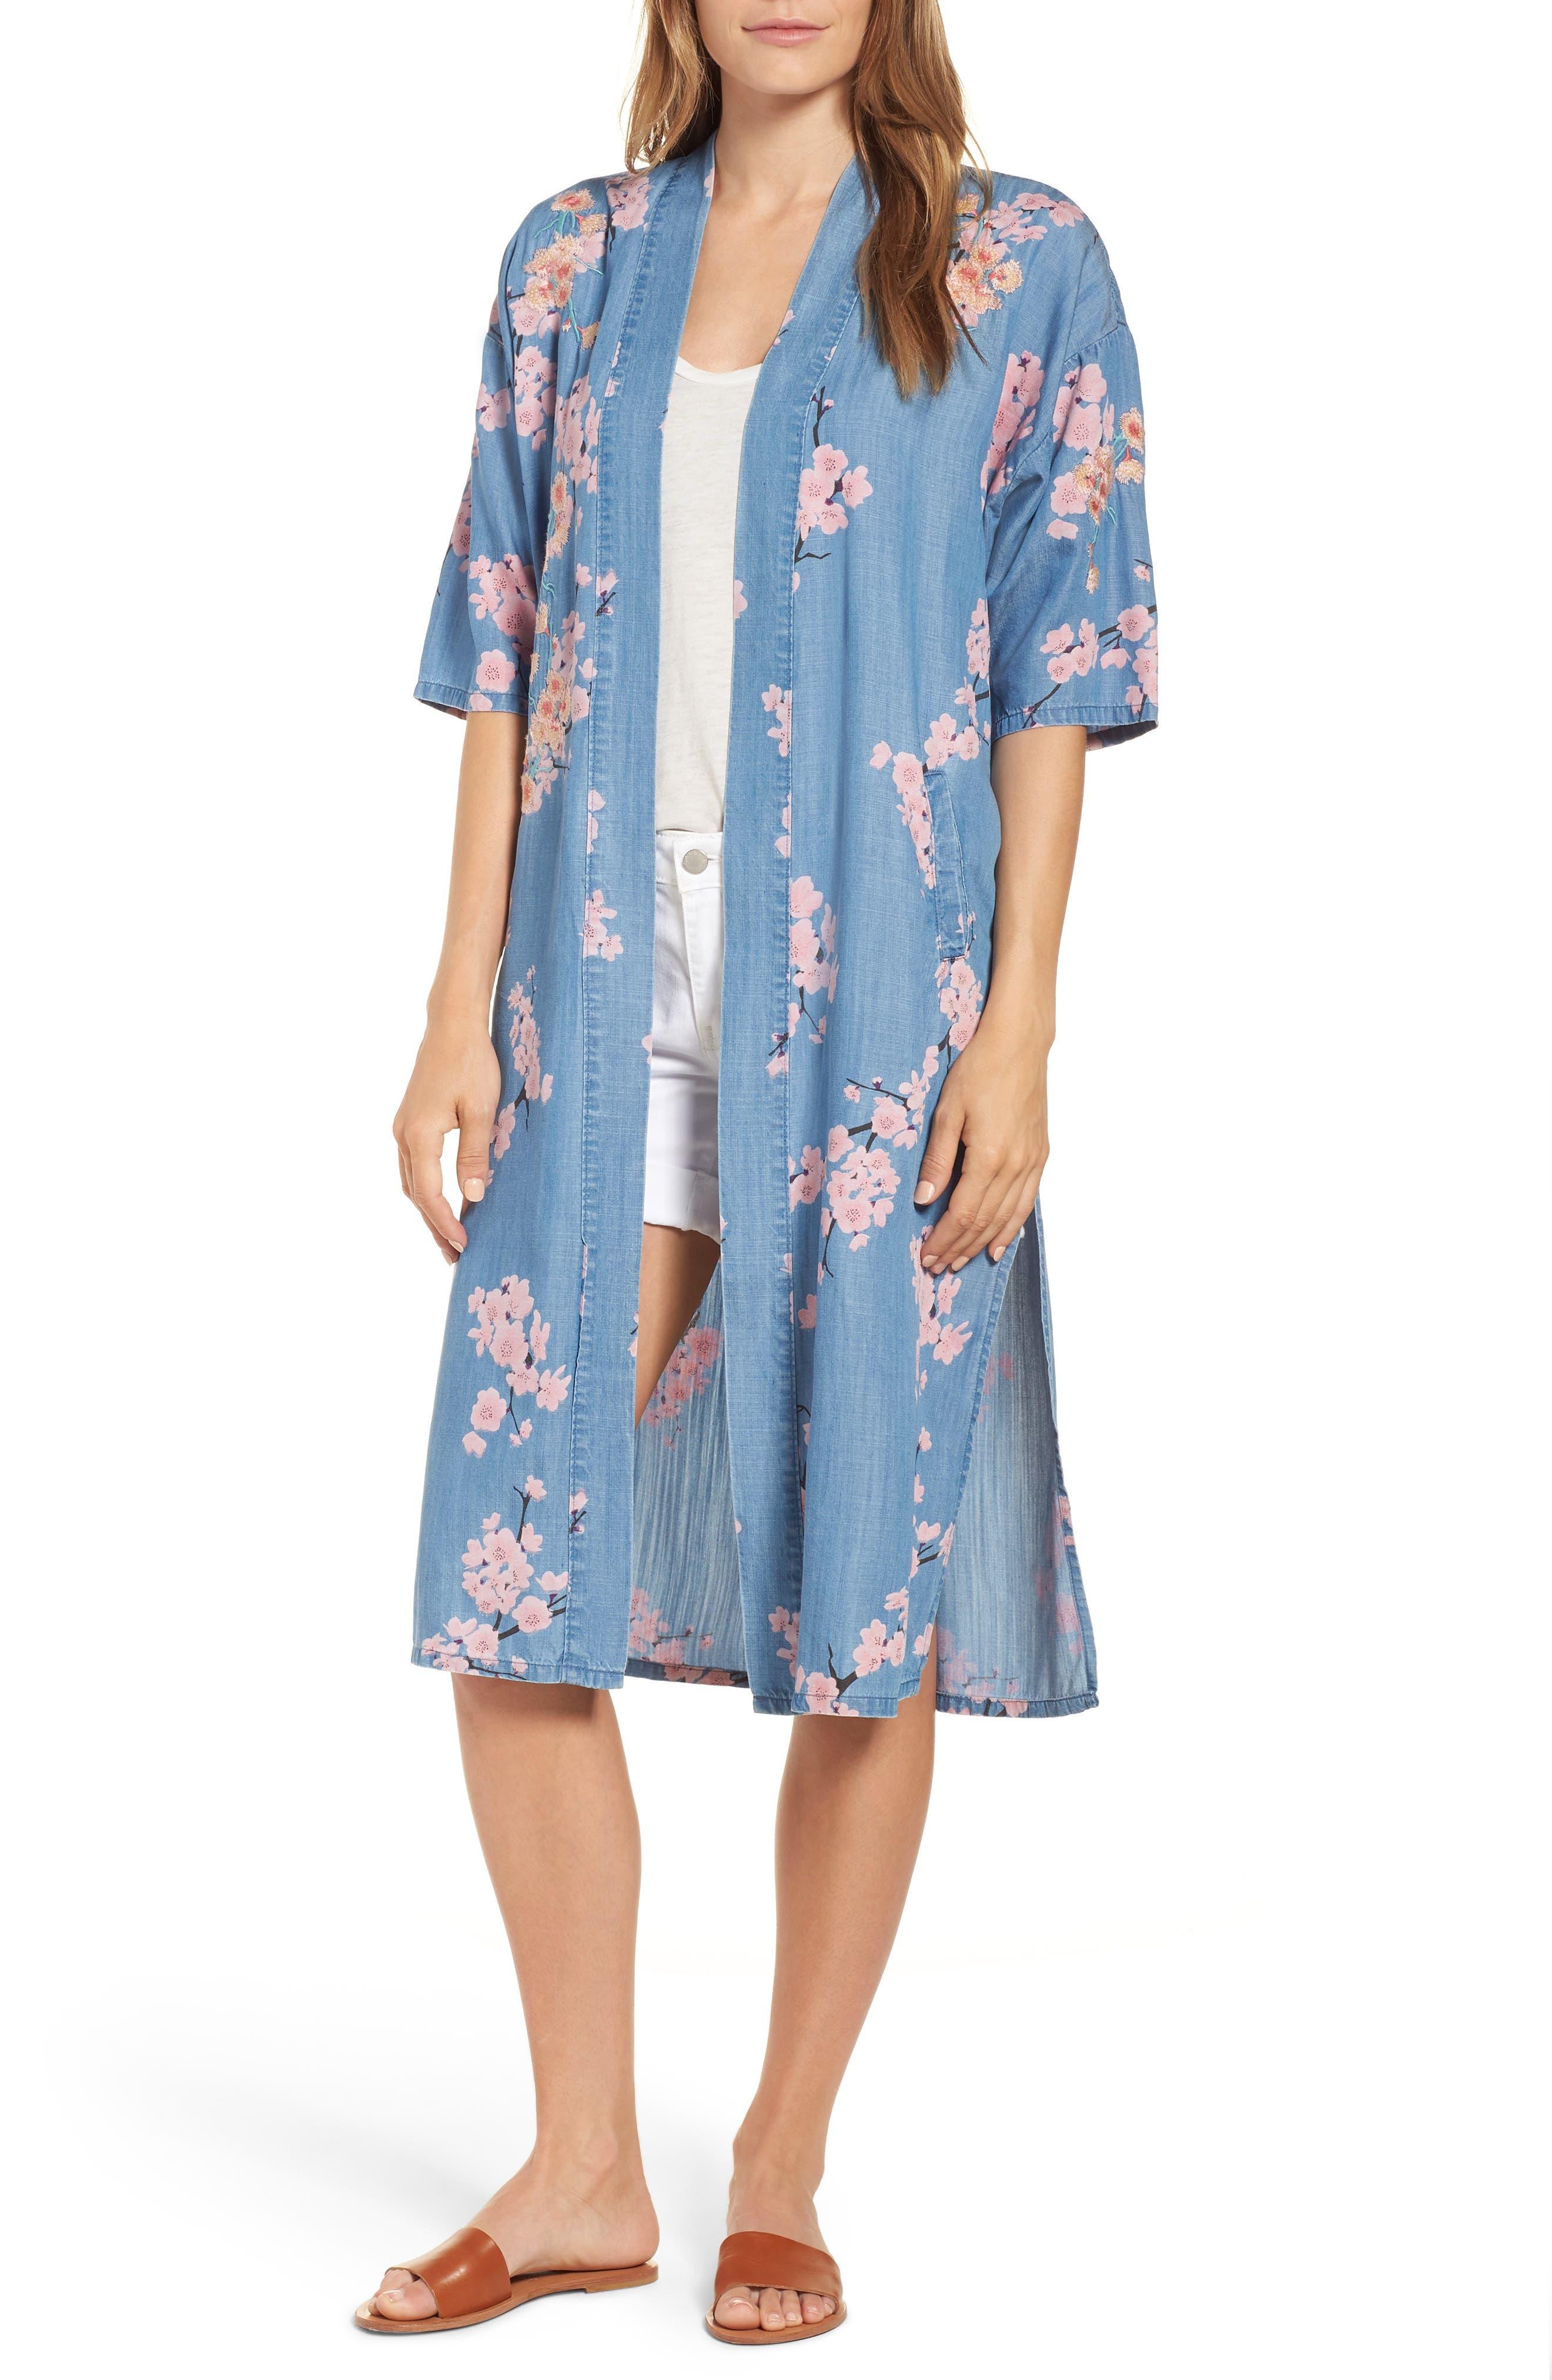 Cherry Blossom Kimono,                             Main thumbnail 1, color,                             Blue Cherry Blossom